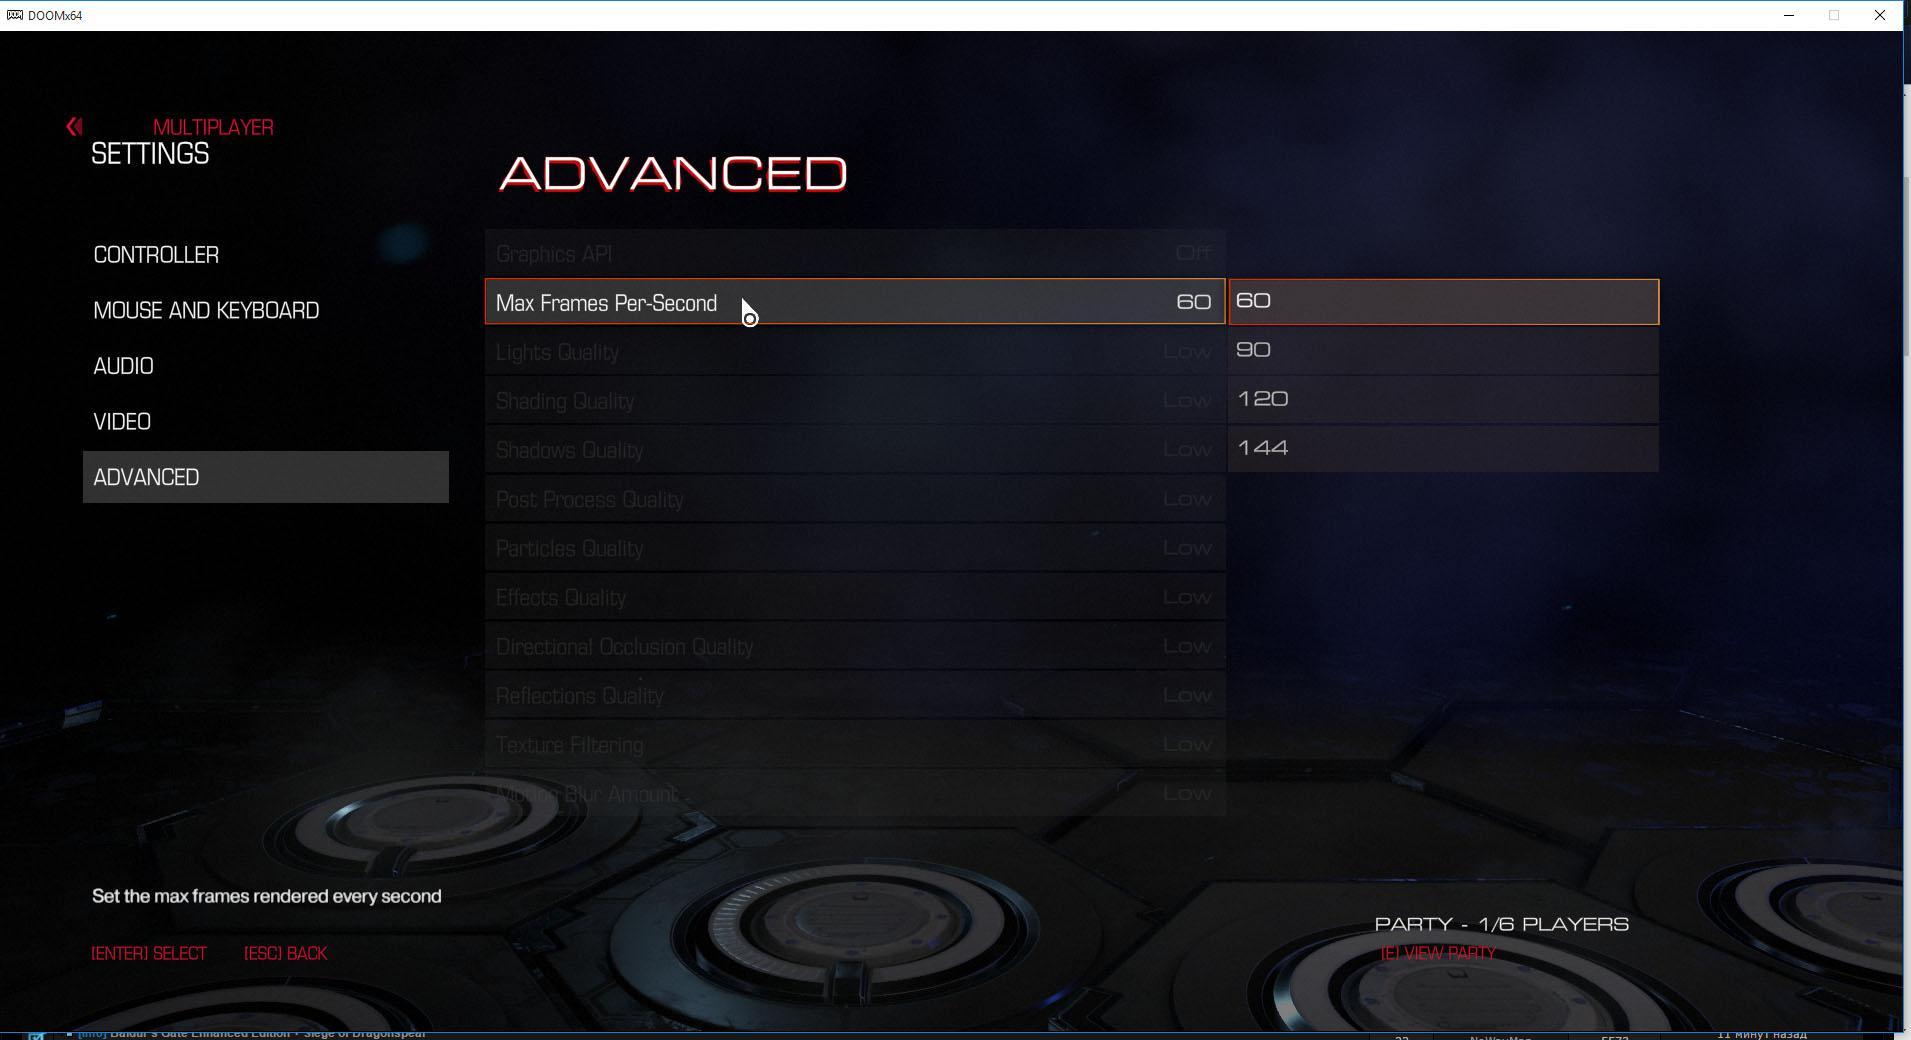 Doom Beta Locked Advanced Settings Revealed Includes Max